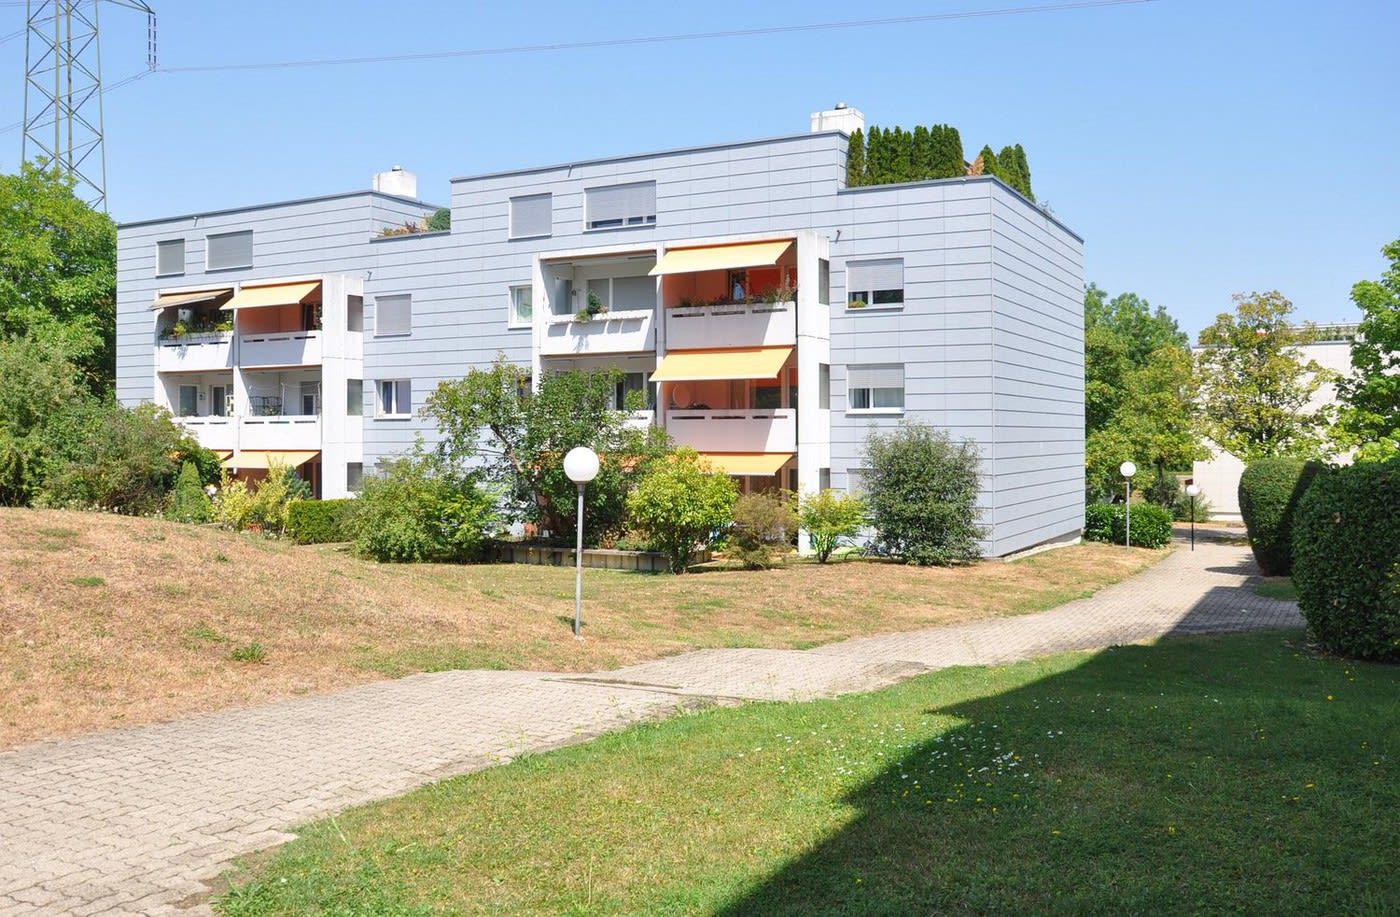 Bodenacherstrasse 8